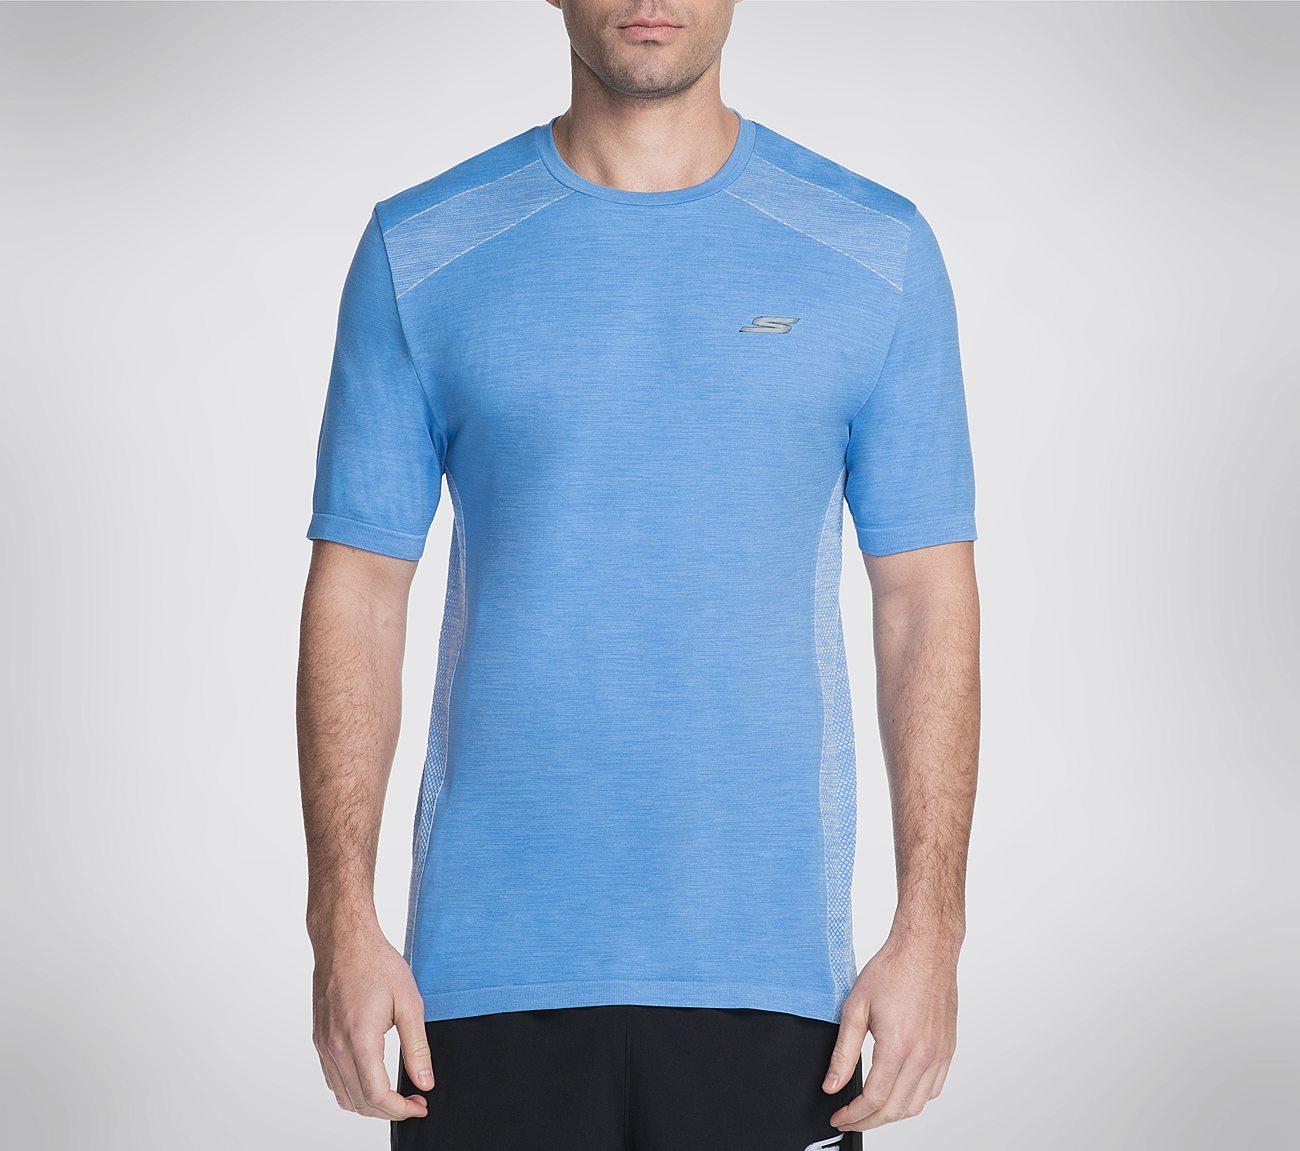 Skechers GO Knit Seamless Tee Shirt | Tuggl